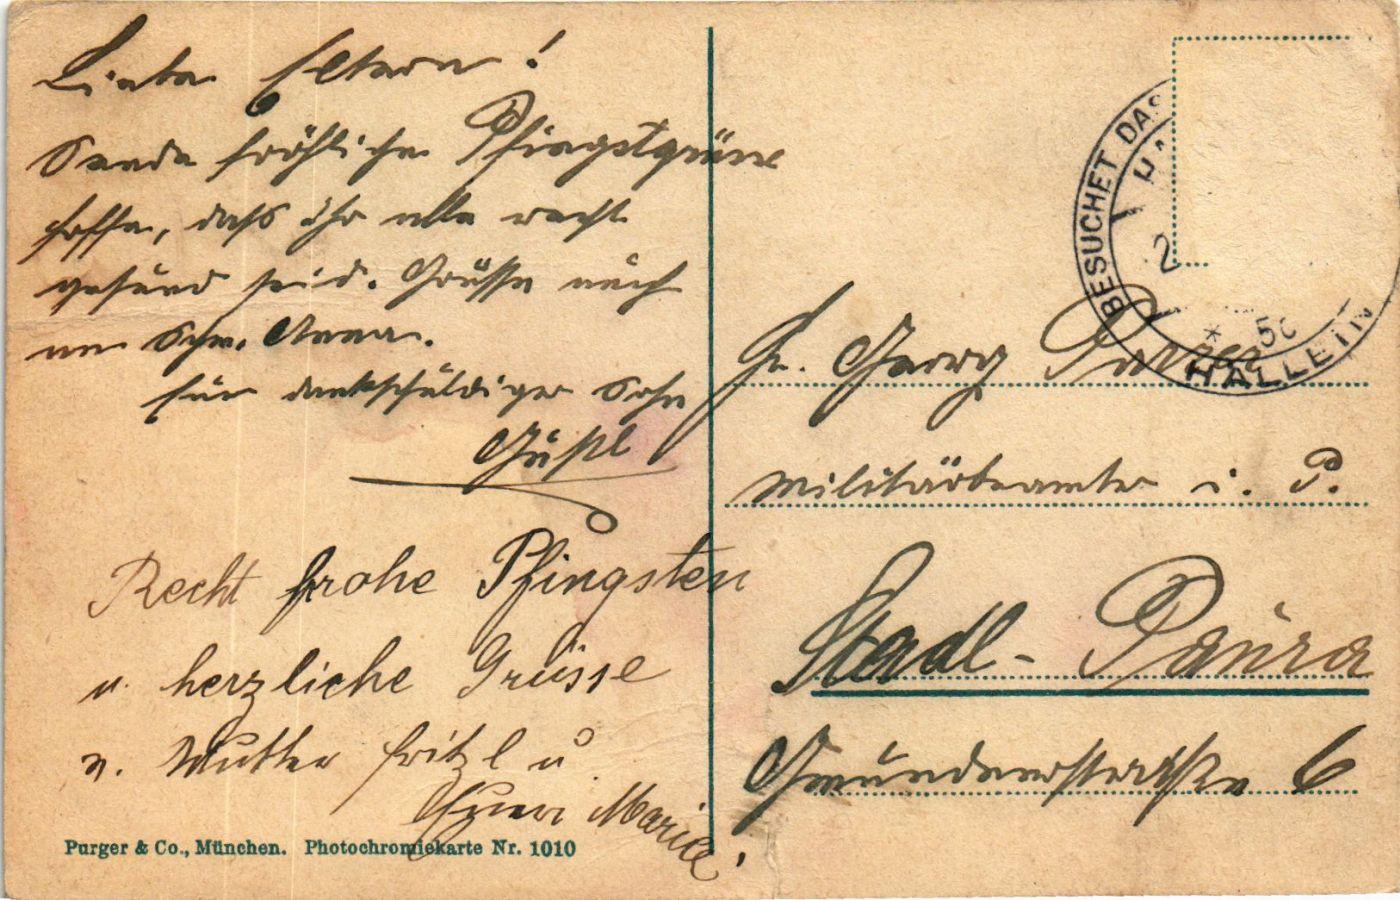 CPA-AK-Konigssee-St-Bartholoma-GERMANY-878918 miniature 2